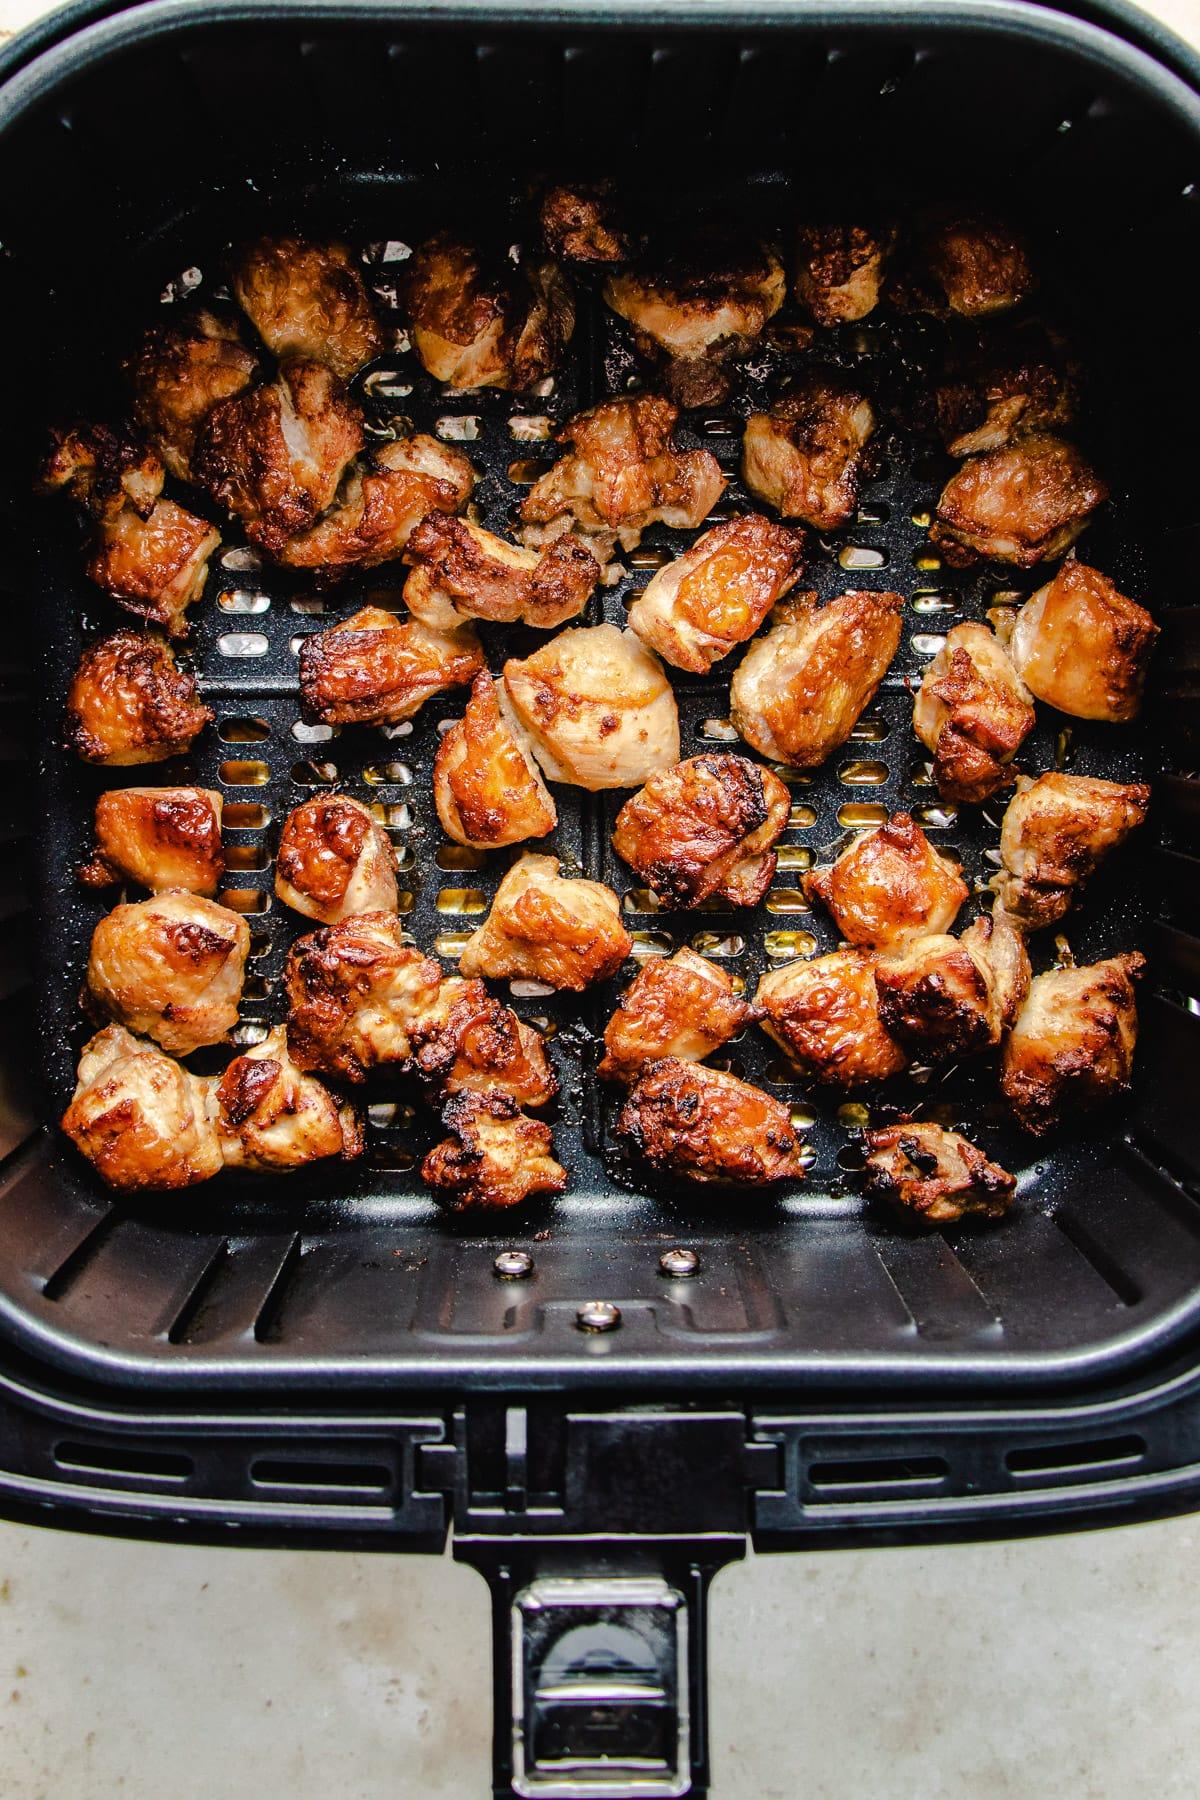 air fry the chicken to golden crisp